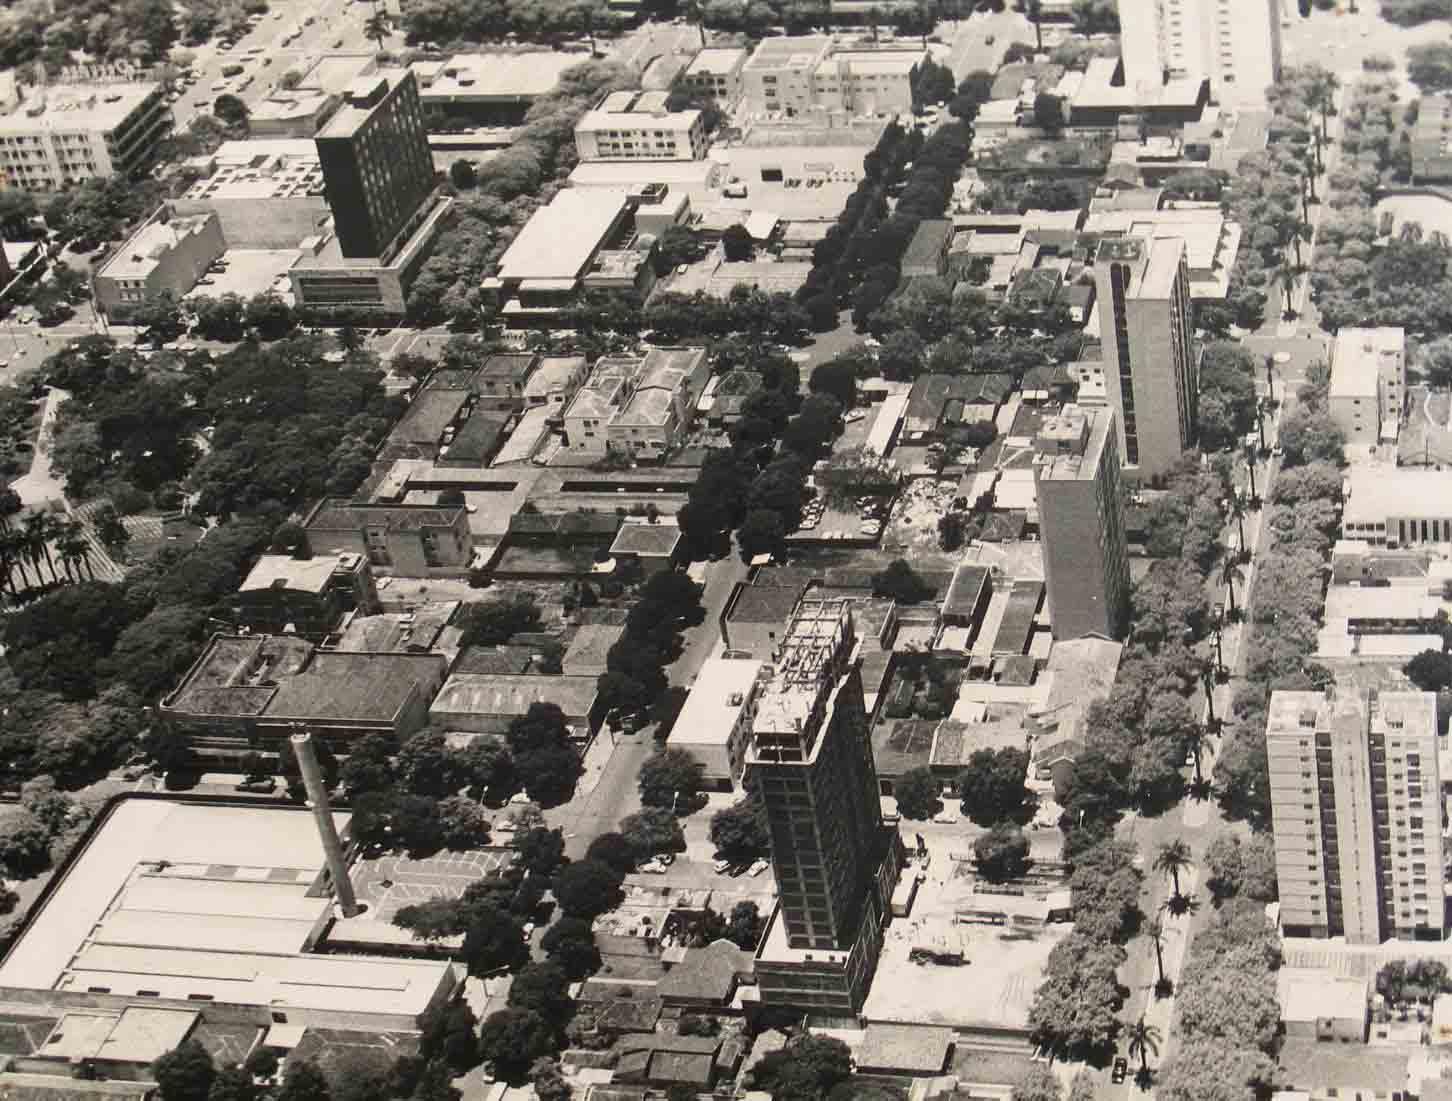 Avenida XV de Novembro / Rua Néo Alves Martins / Rua Santos Dumont - 1982